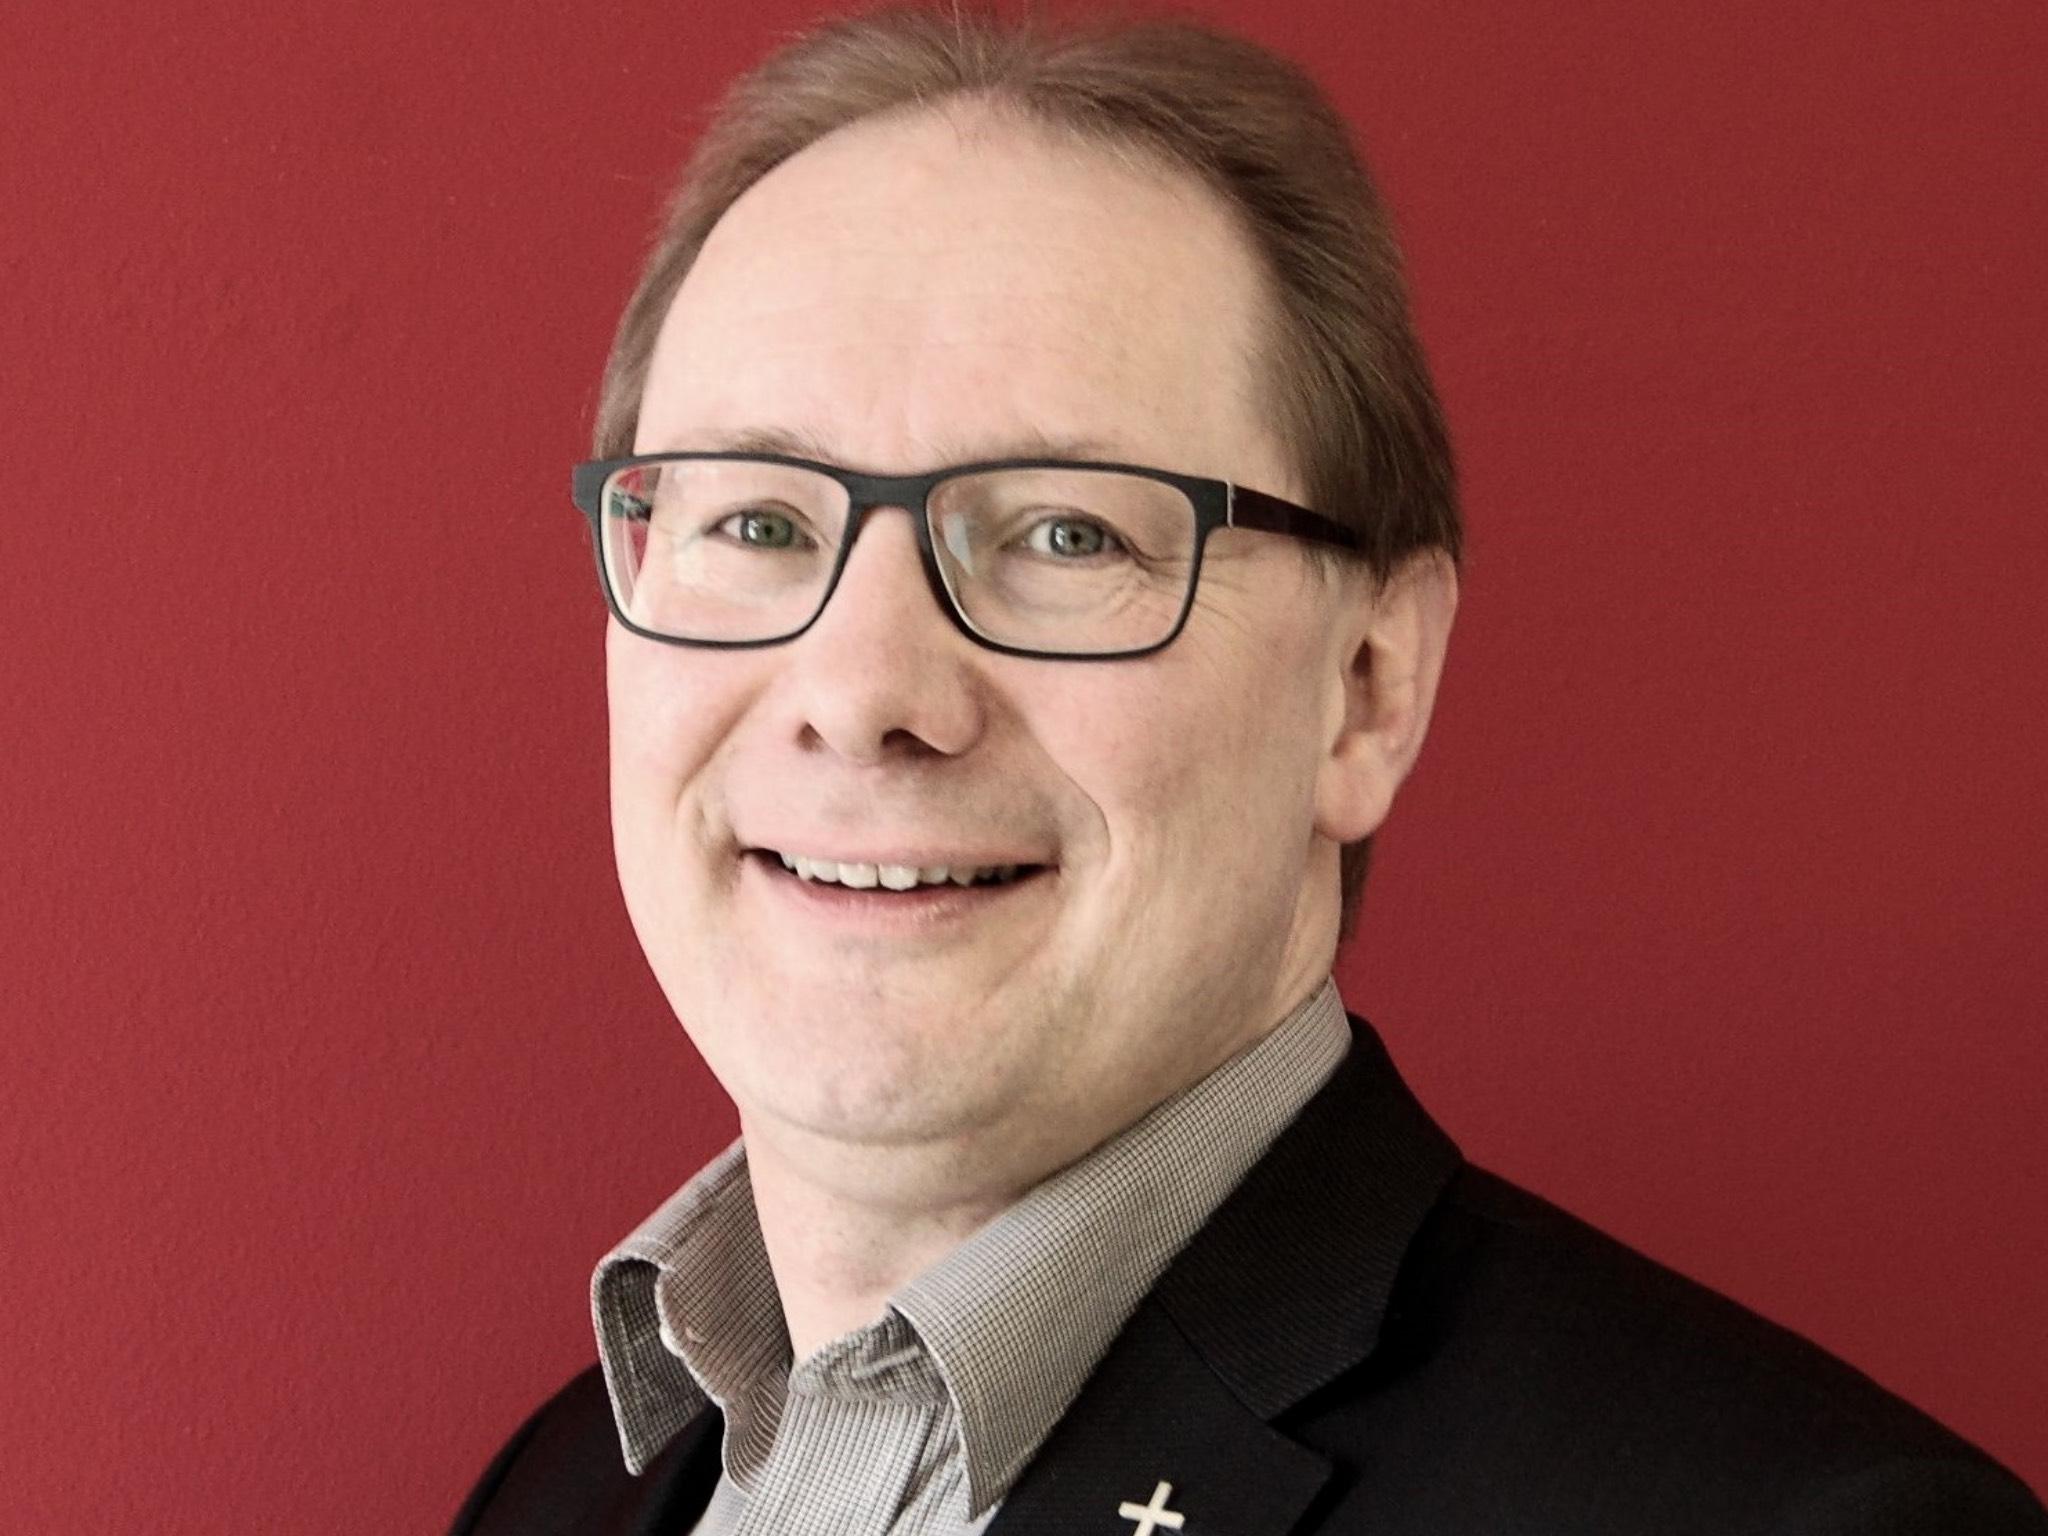 Pfarrer Thomas Eschenbacher. Foto: Markus Hauck (POW)